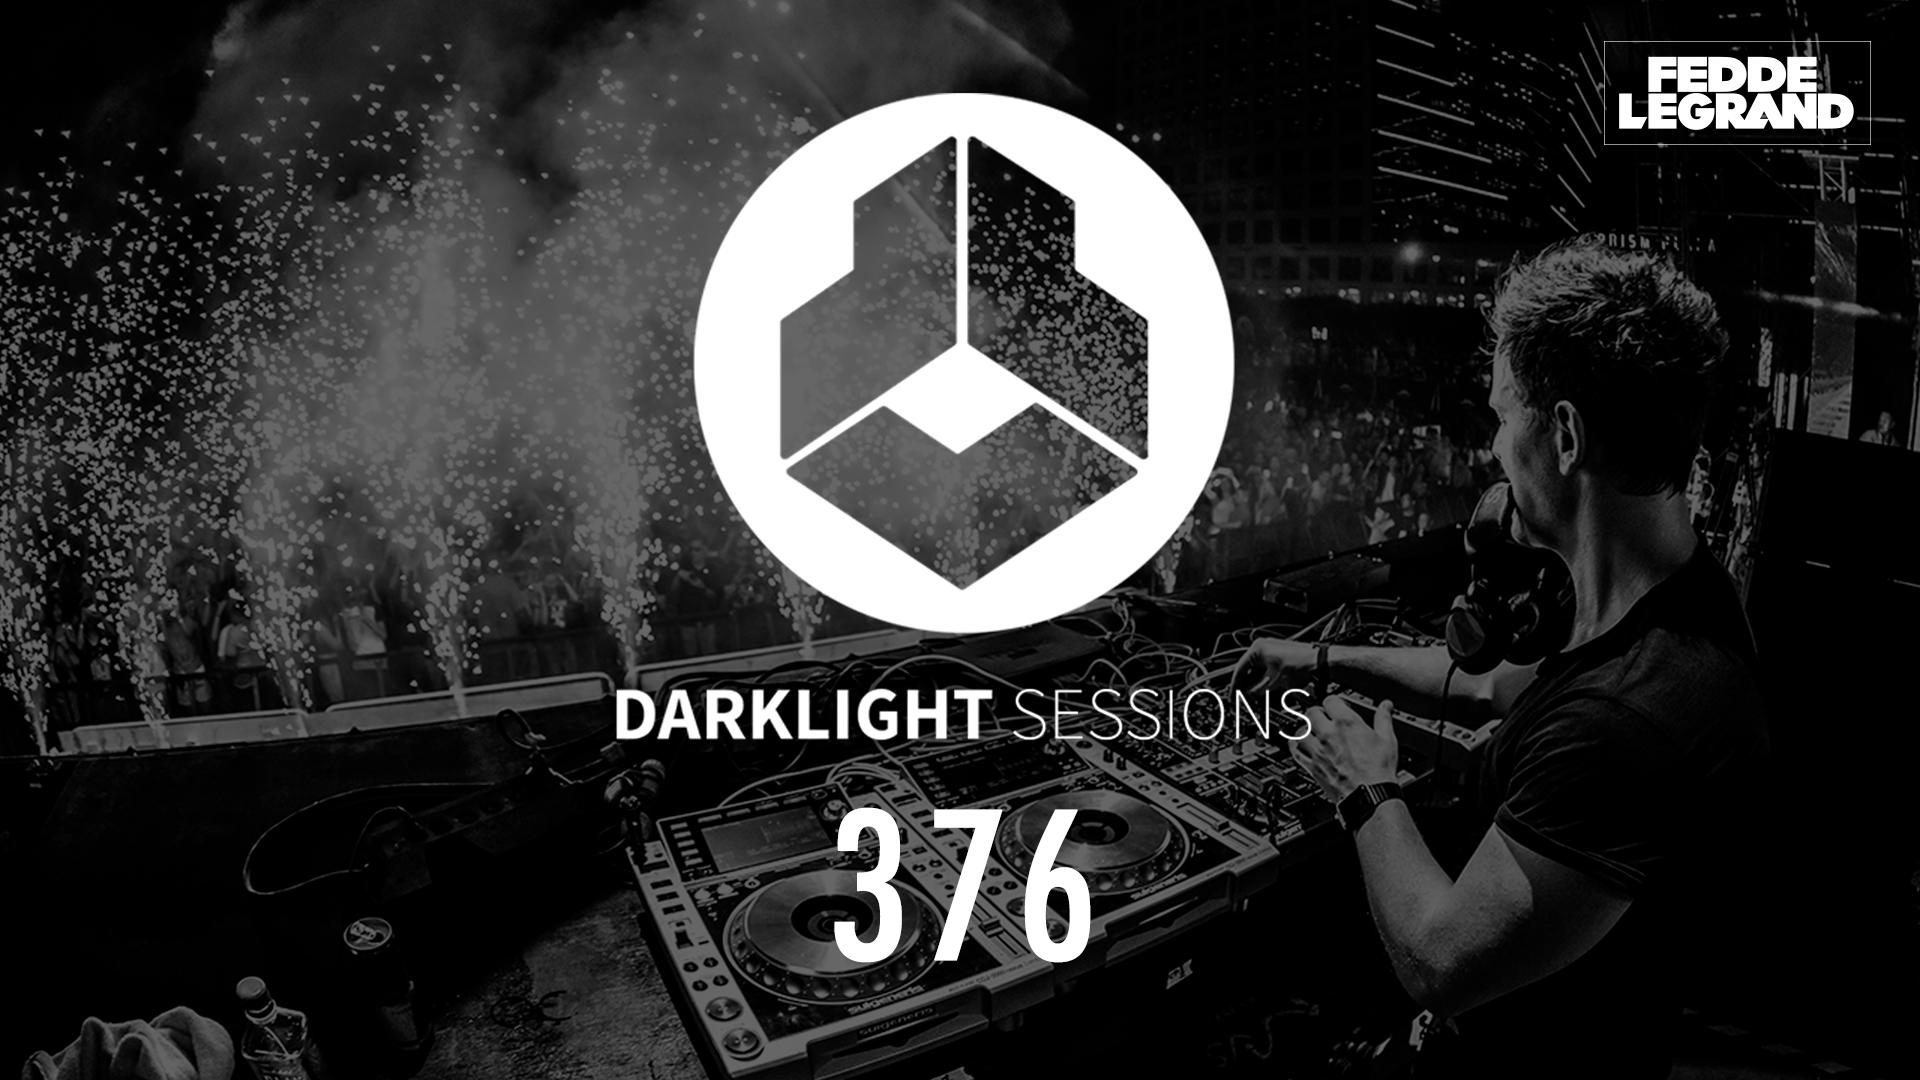 Darklight Sessions 376